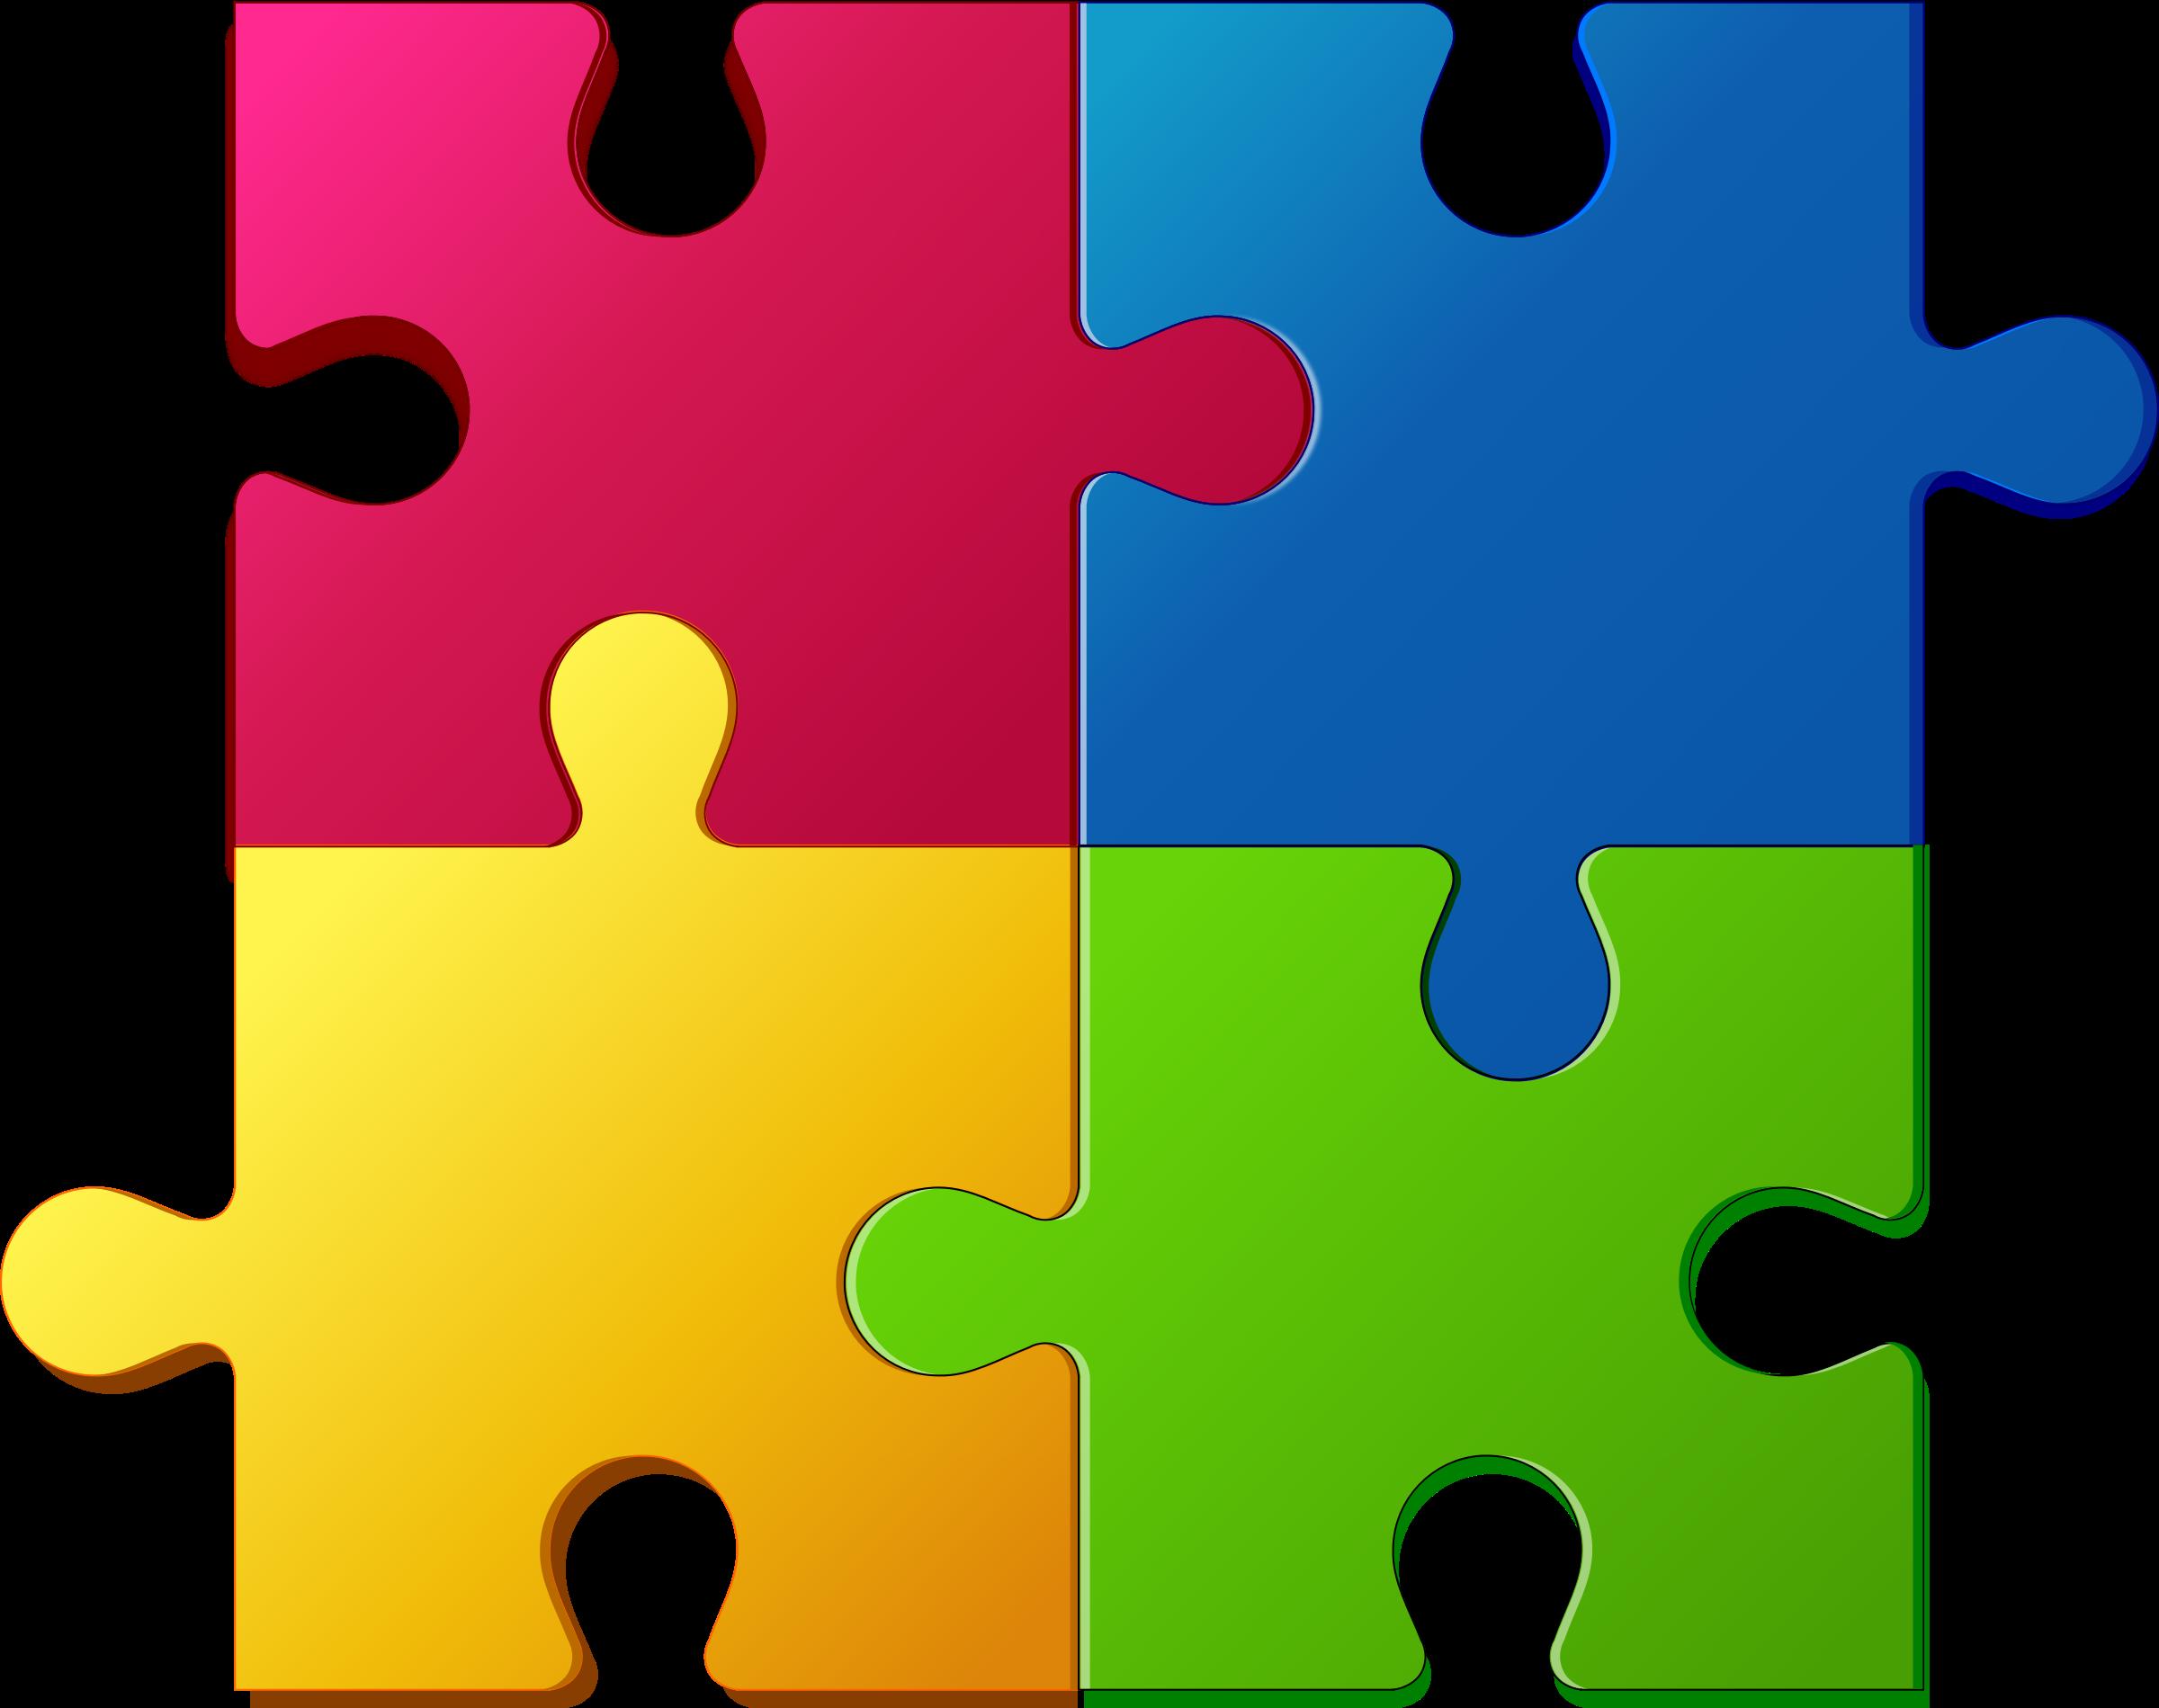 Clipart - Jigsaw-puzzle - ClipArt Best - ClipArt Best